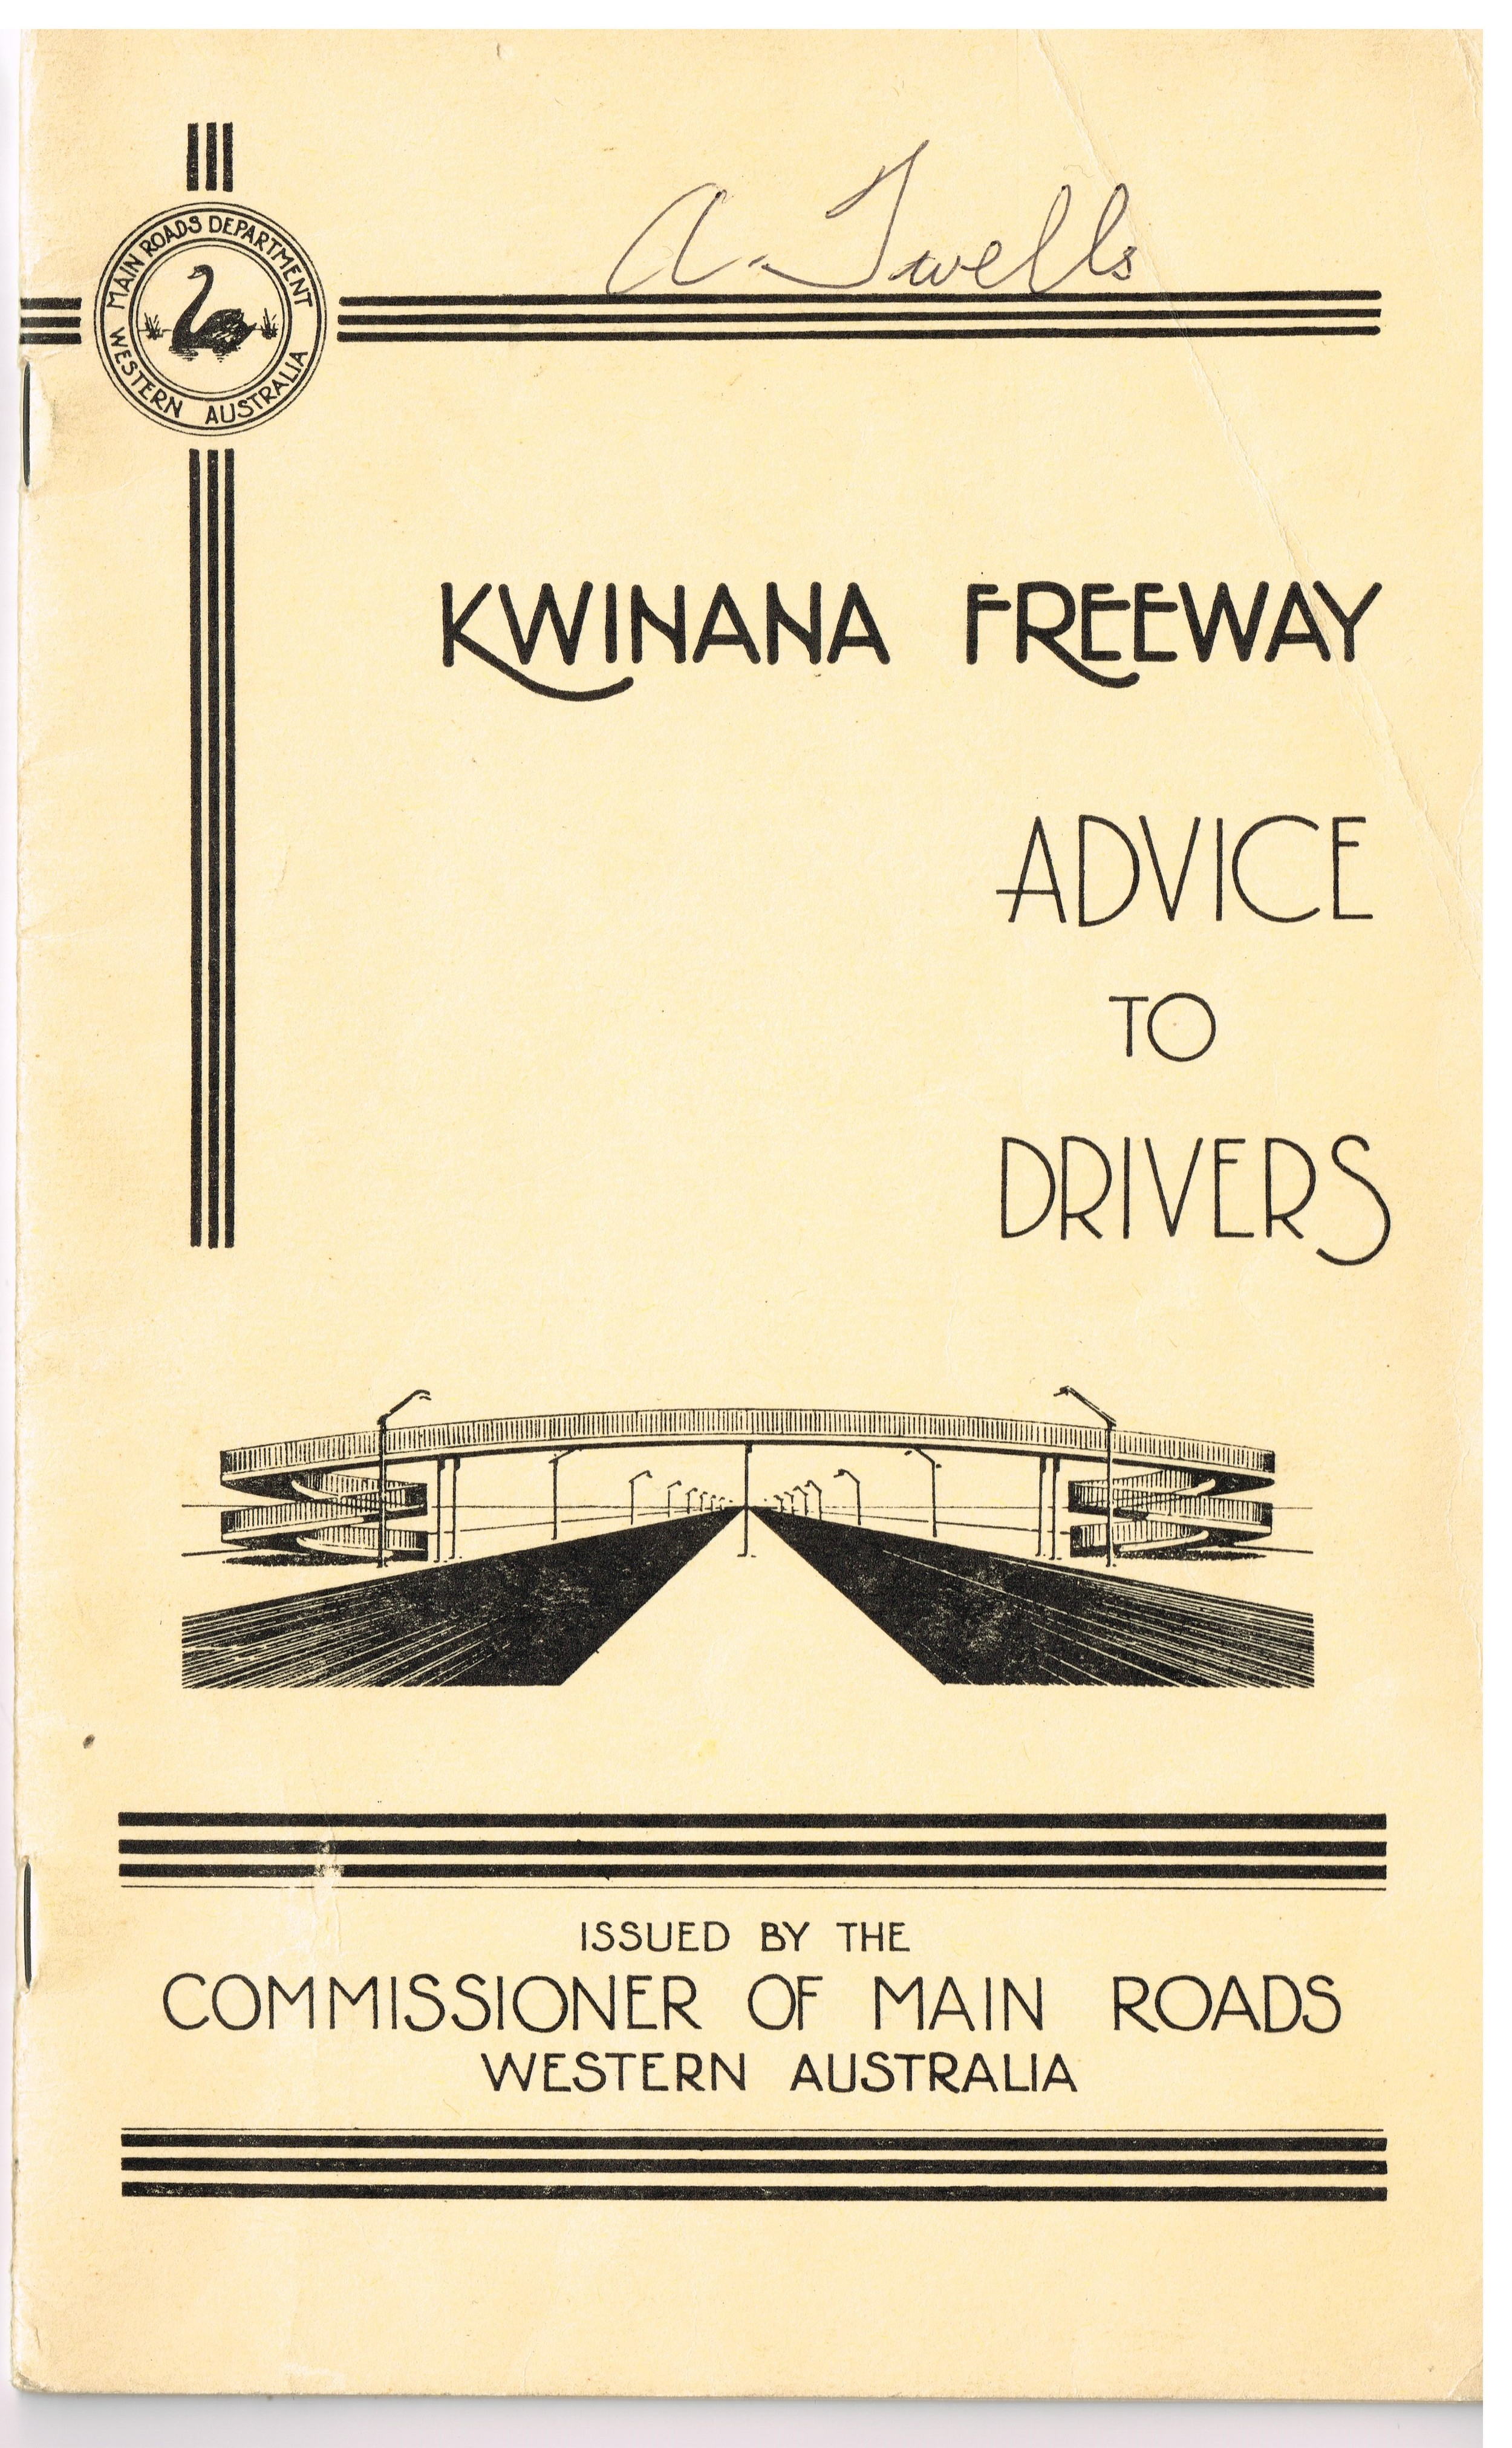 Kwinana-Freeway-Advice-to-Drivers